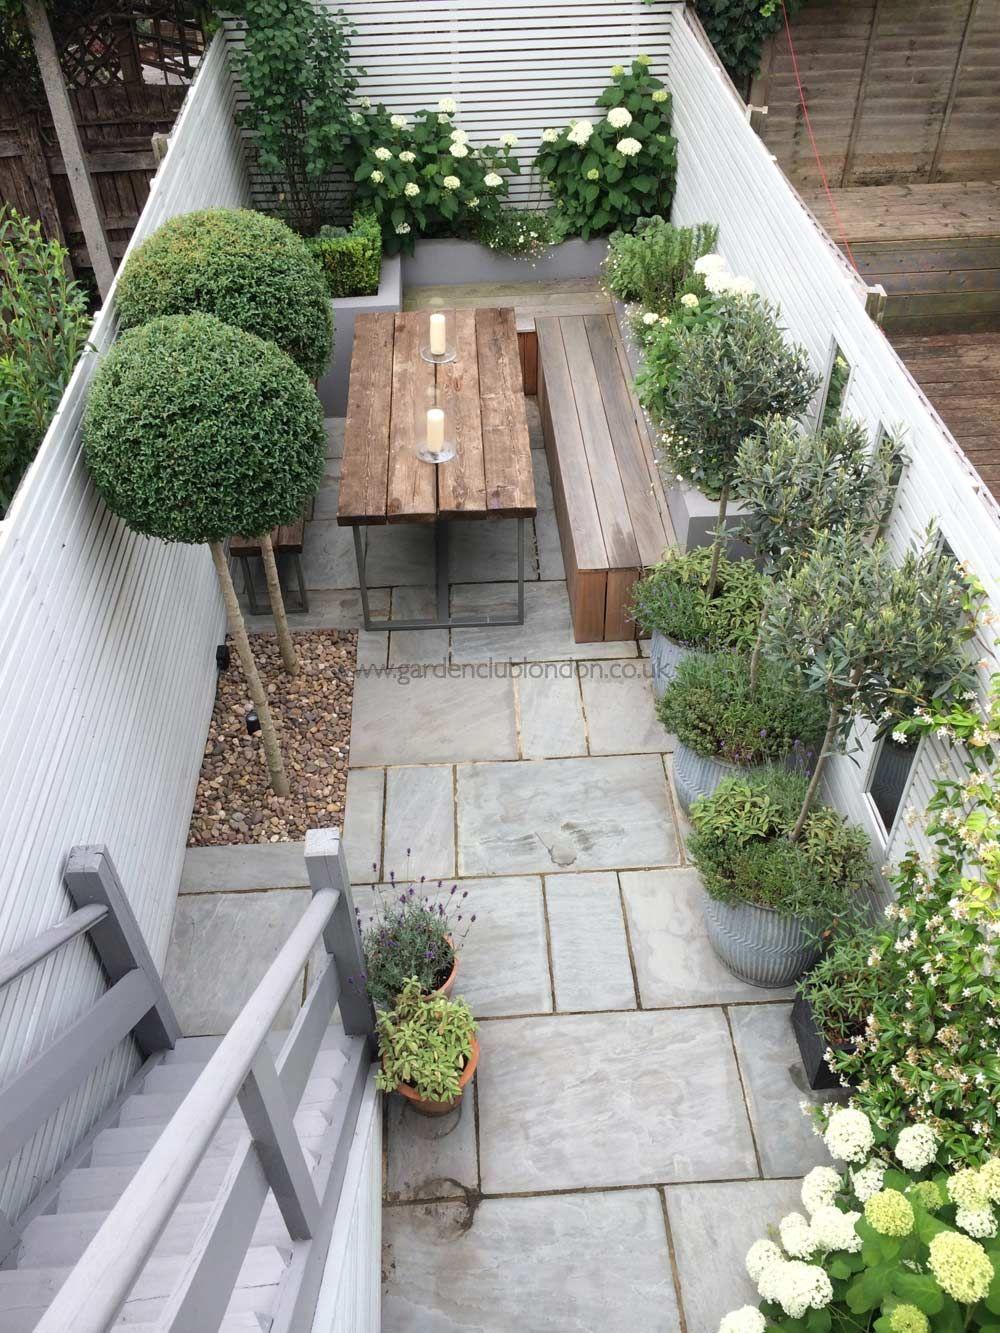 40 garden ideas for a small backyard | lovely stufff | small